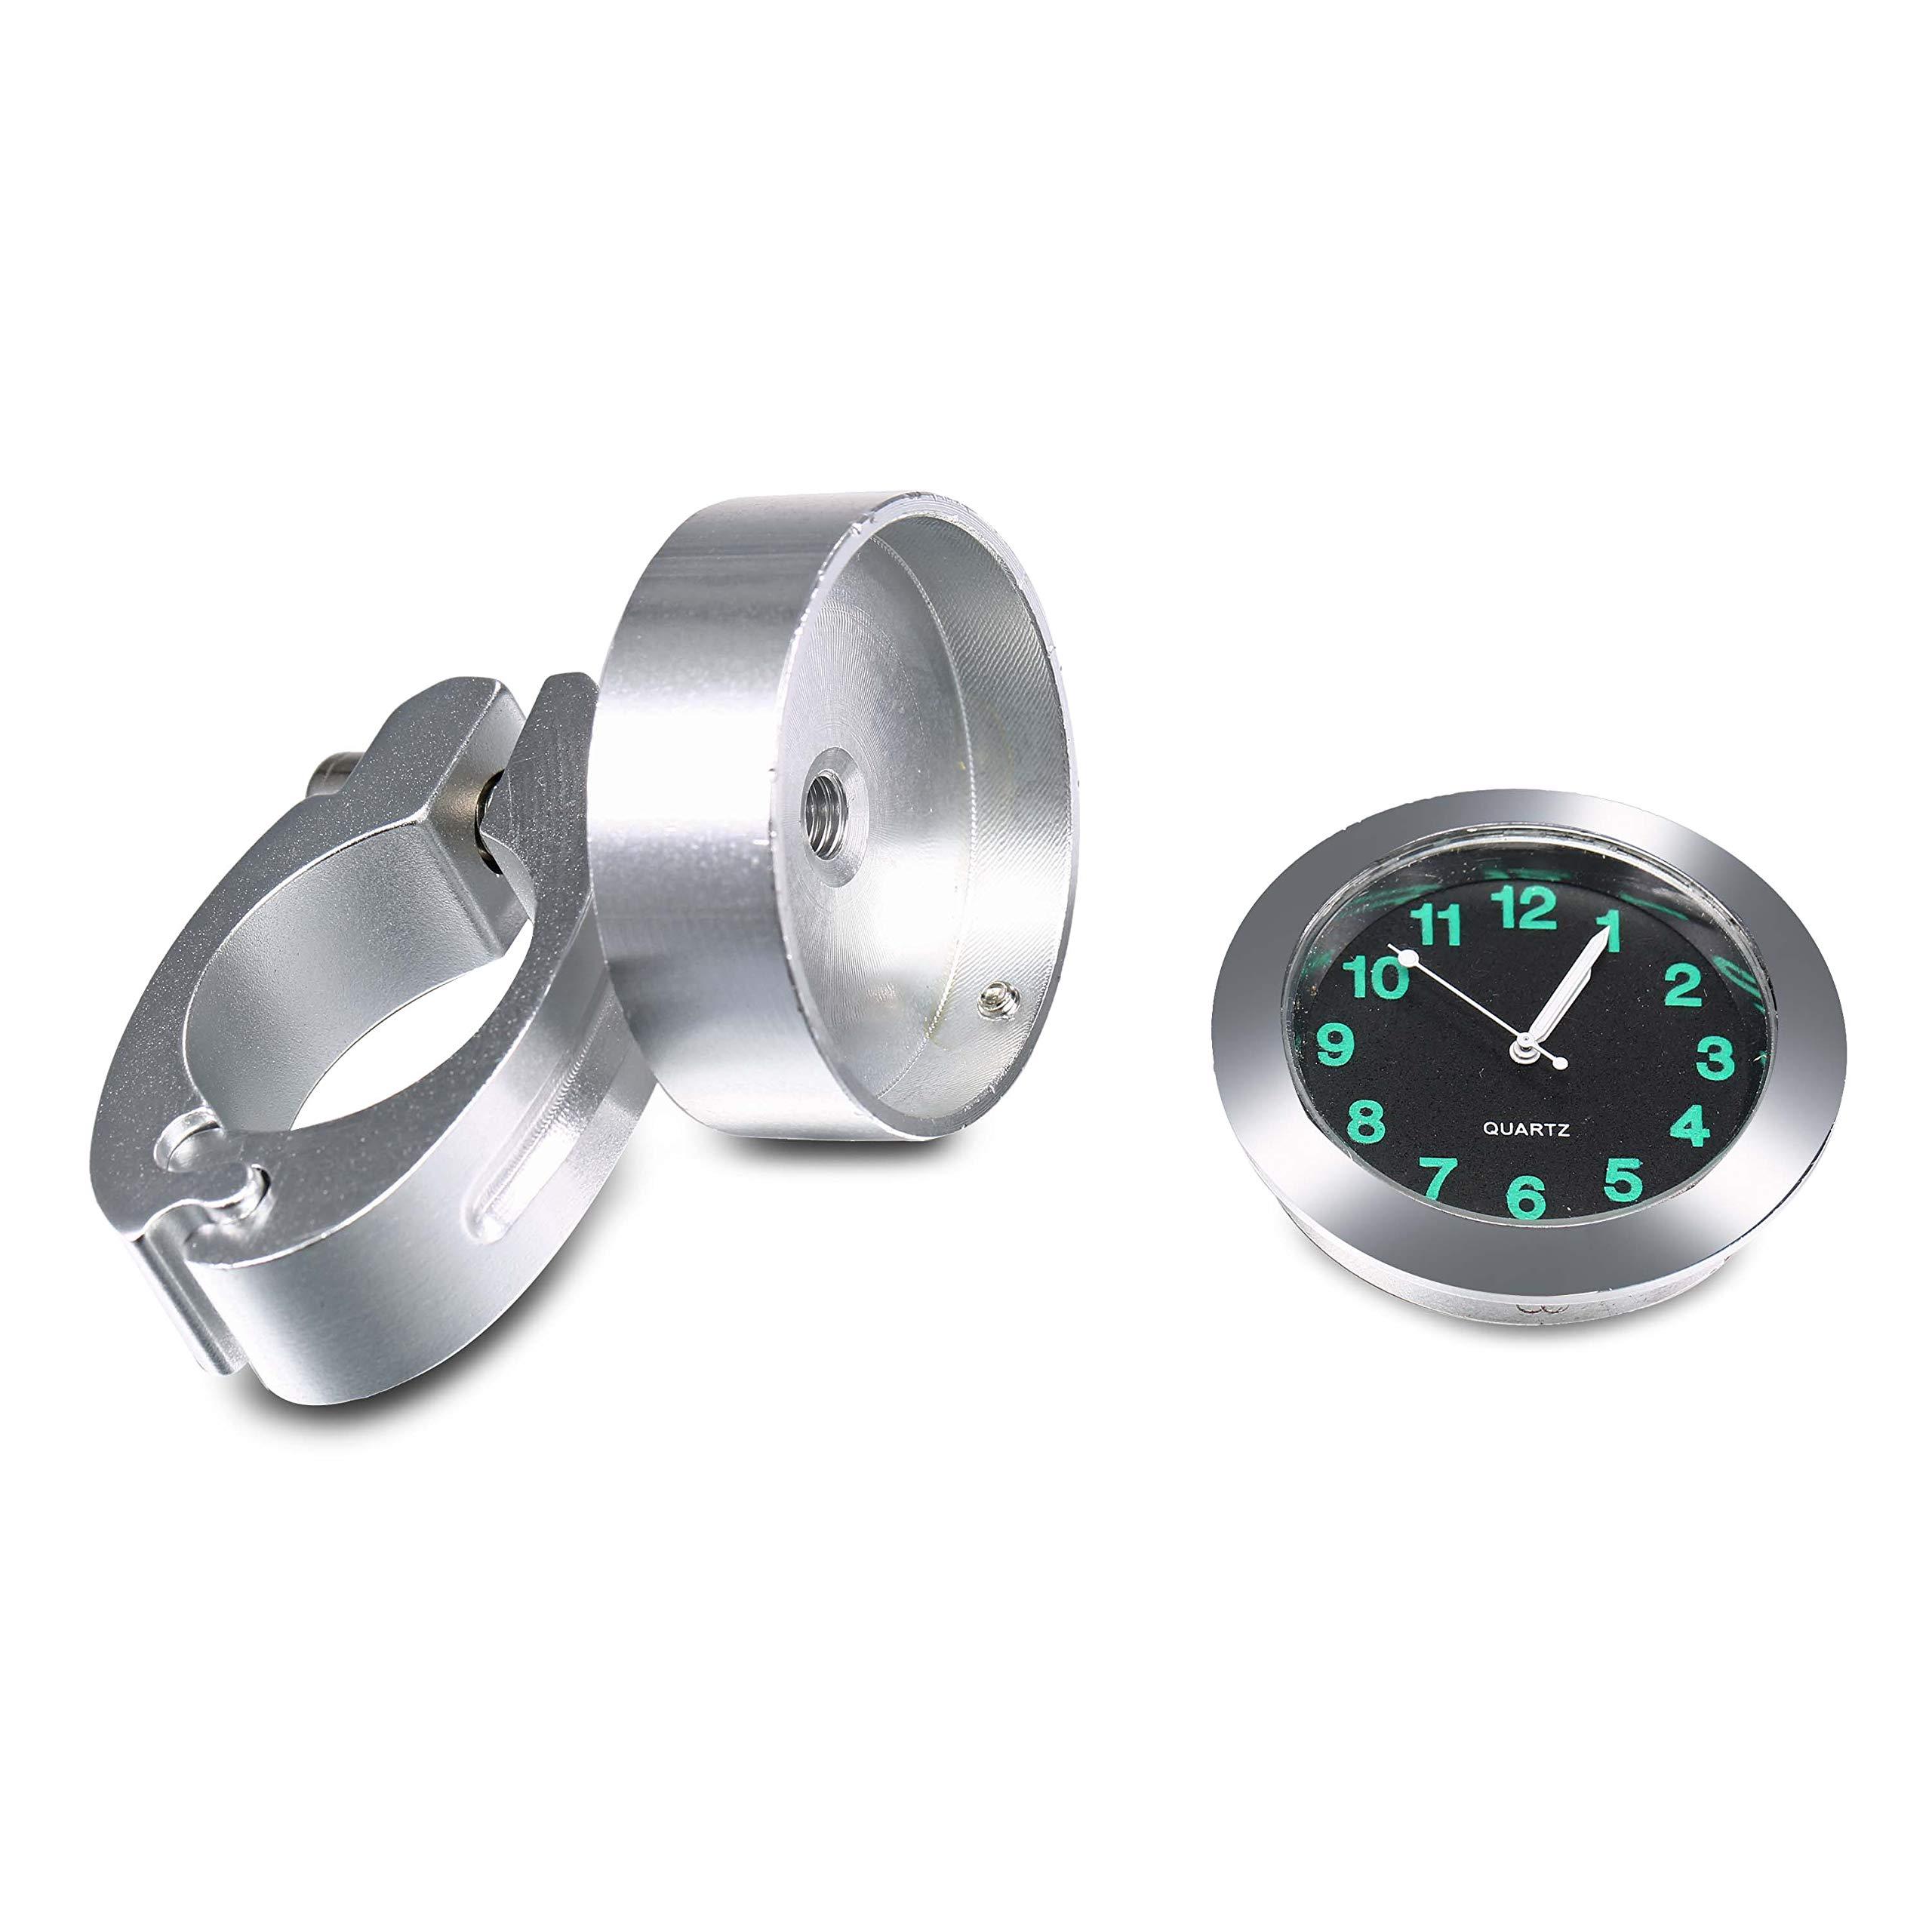 OHMOTOR Universal Waterproof Motorcycle Handlebar Mount Clock Fit 7/8'' or 1'' Handlebar Watch for Harley/honda/yamaha/street Bike by OHMOTOR (Image #4)